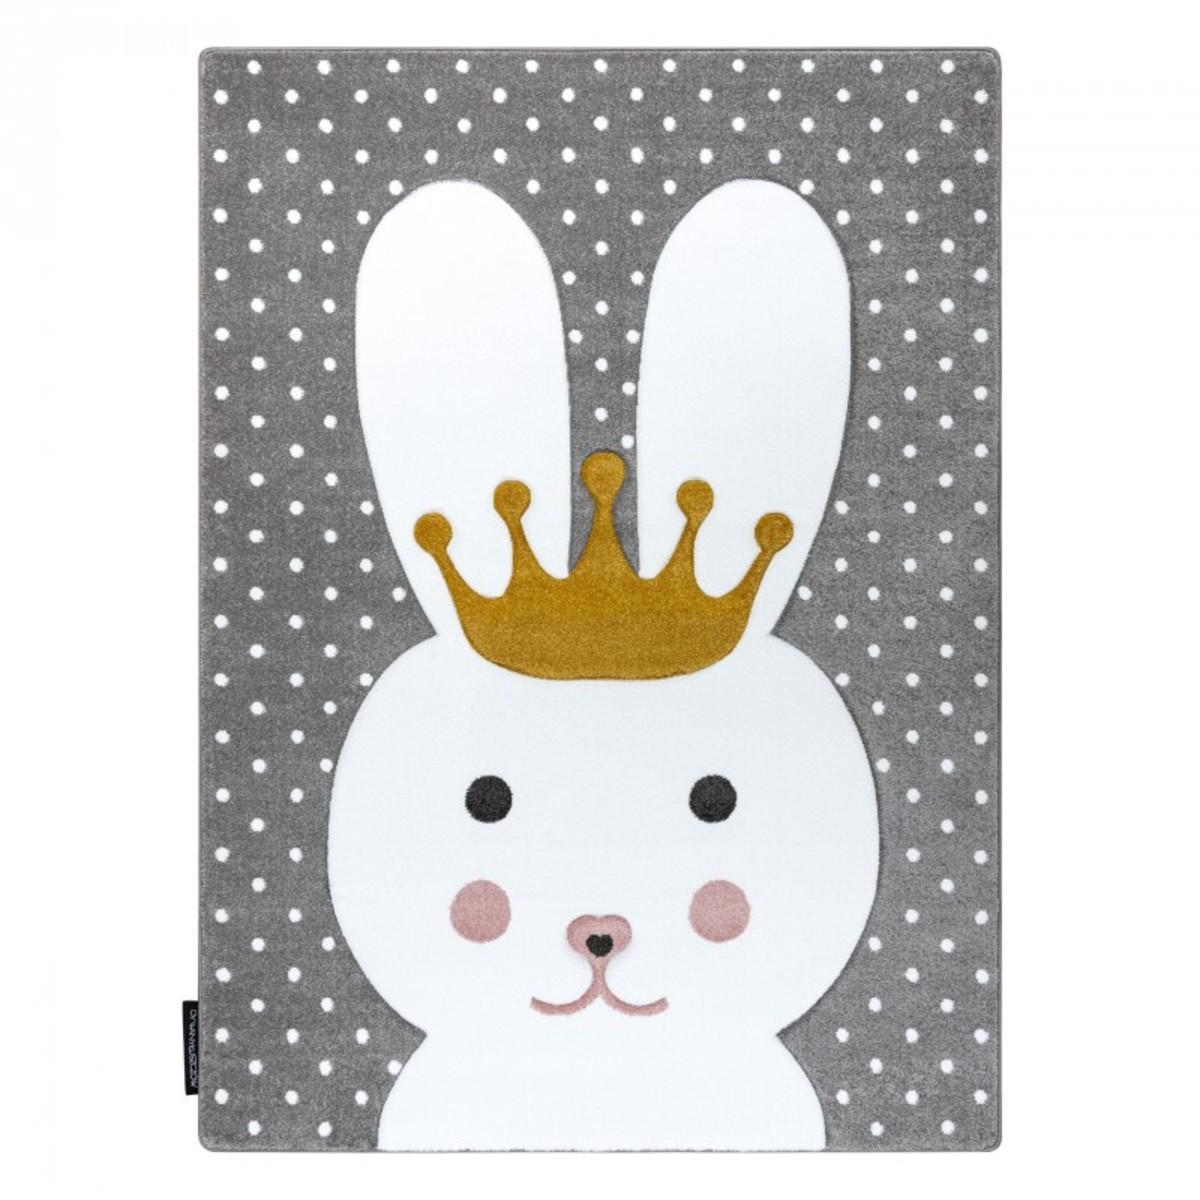 Detský koberec PETIT - Králíček - sivý Bunny rug - grey 120 x 170 cm